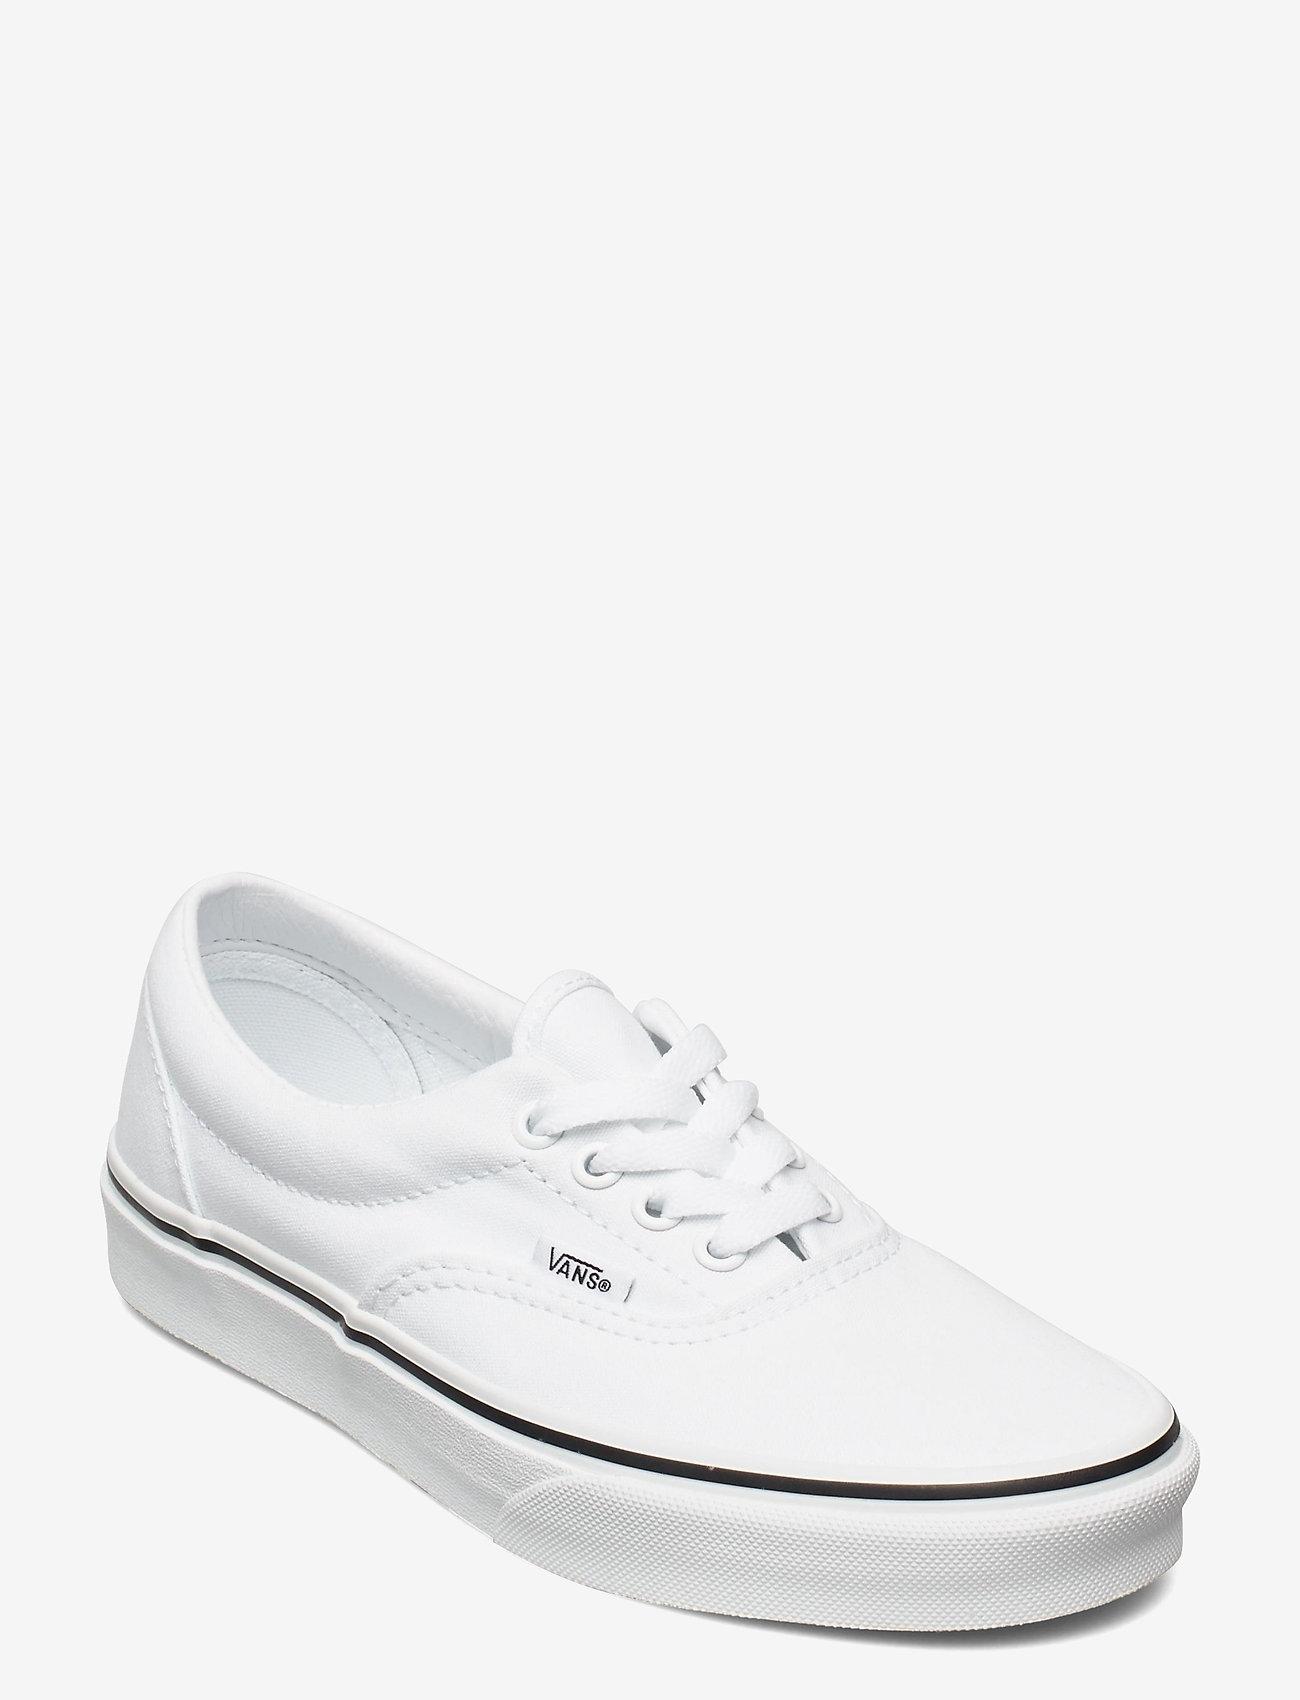 VANS - UA Era - laag sneakers - true white - 0